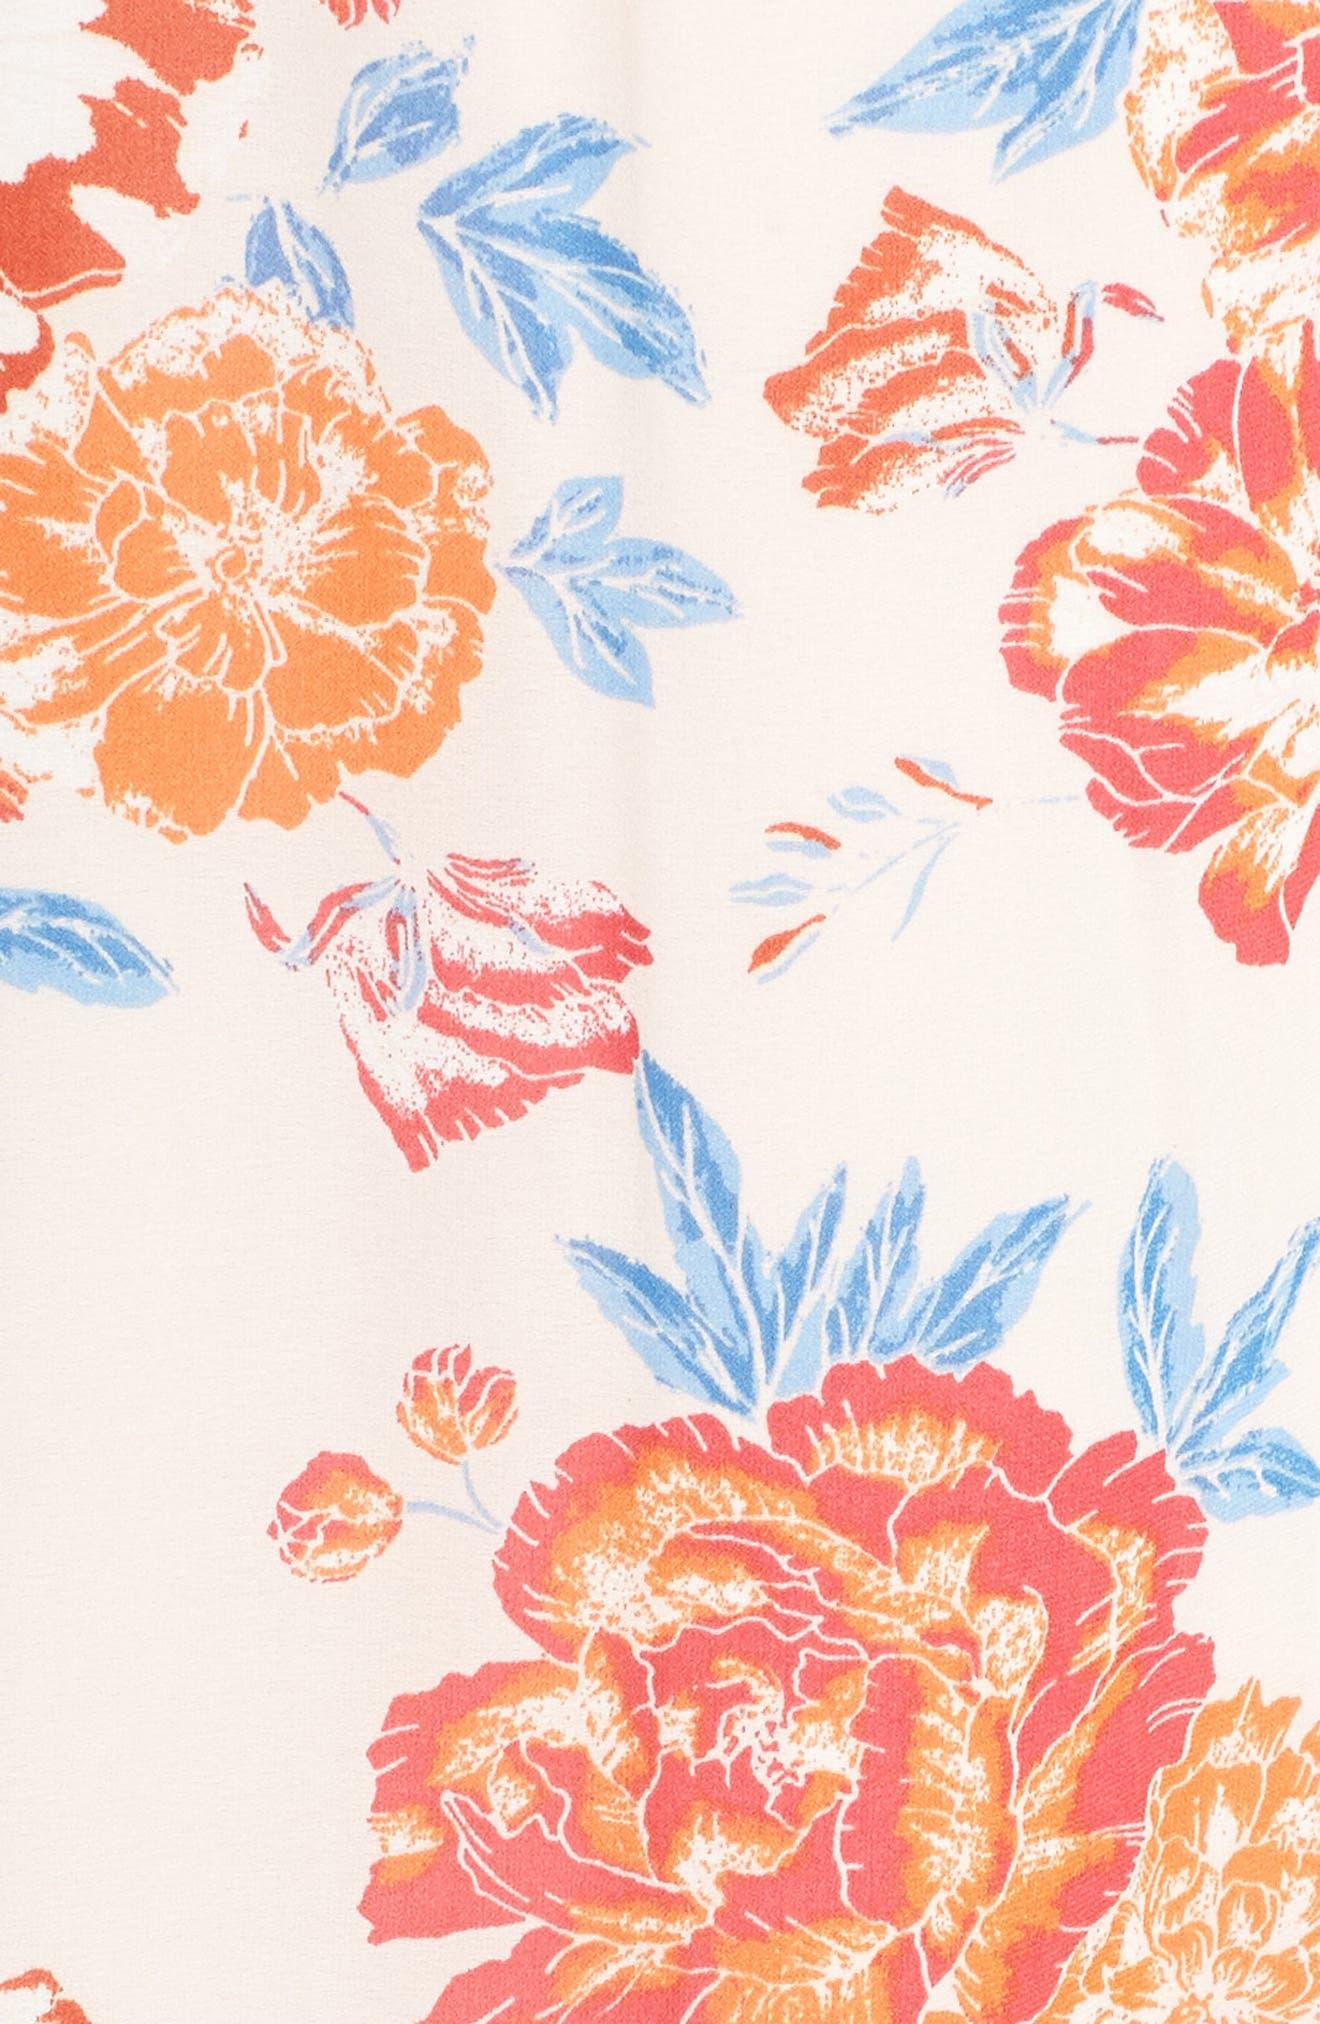 Floral Tie Waist Maxi Dress,                             Alternate thumbnail 6, color,                             Pink/ Coral Multi